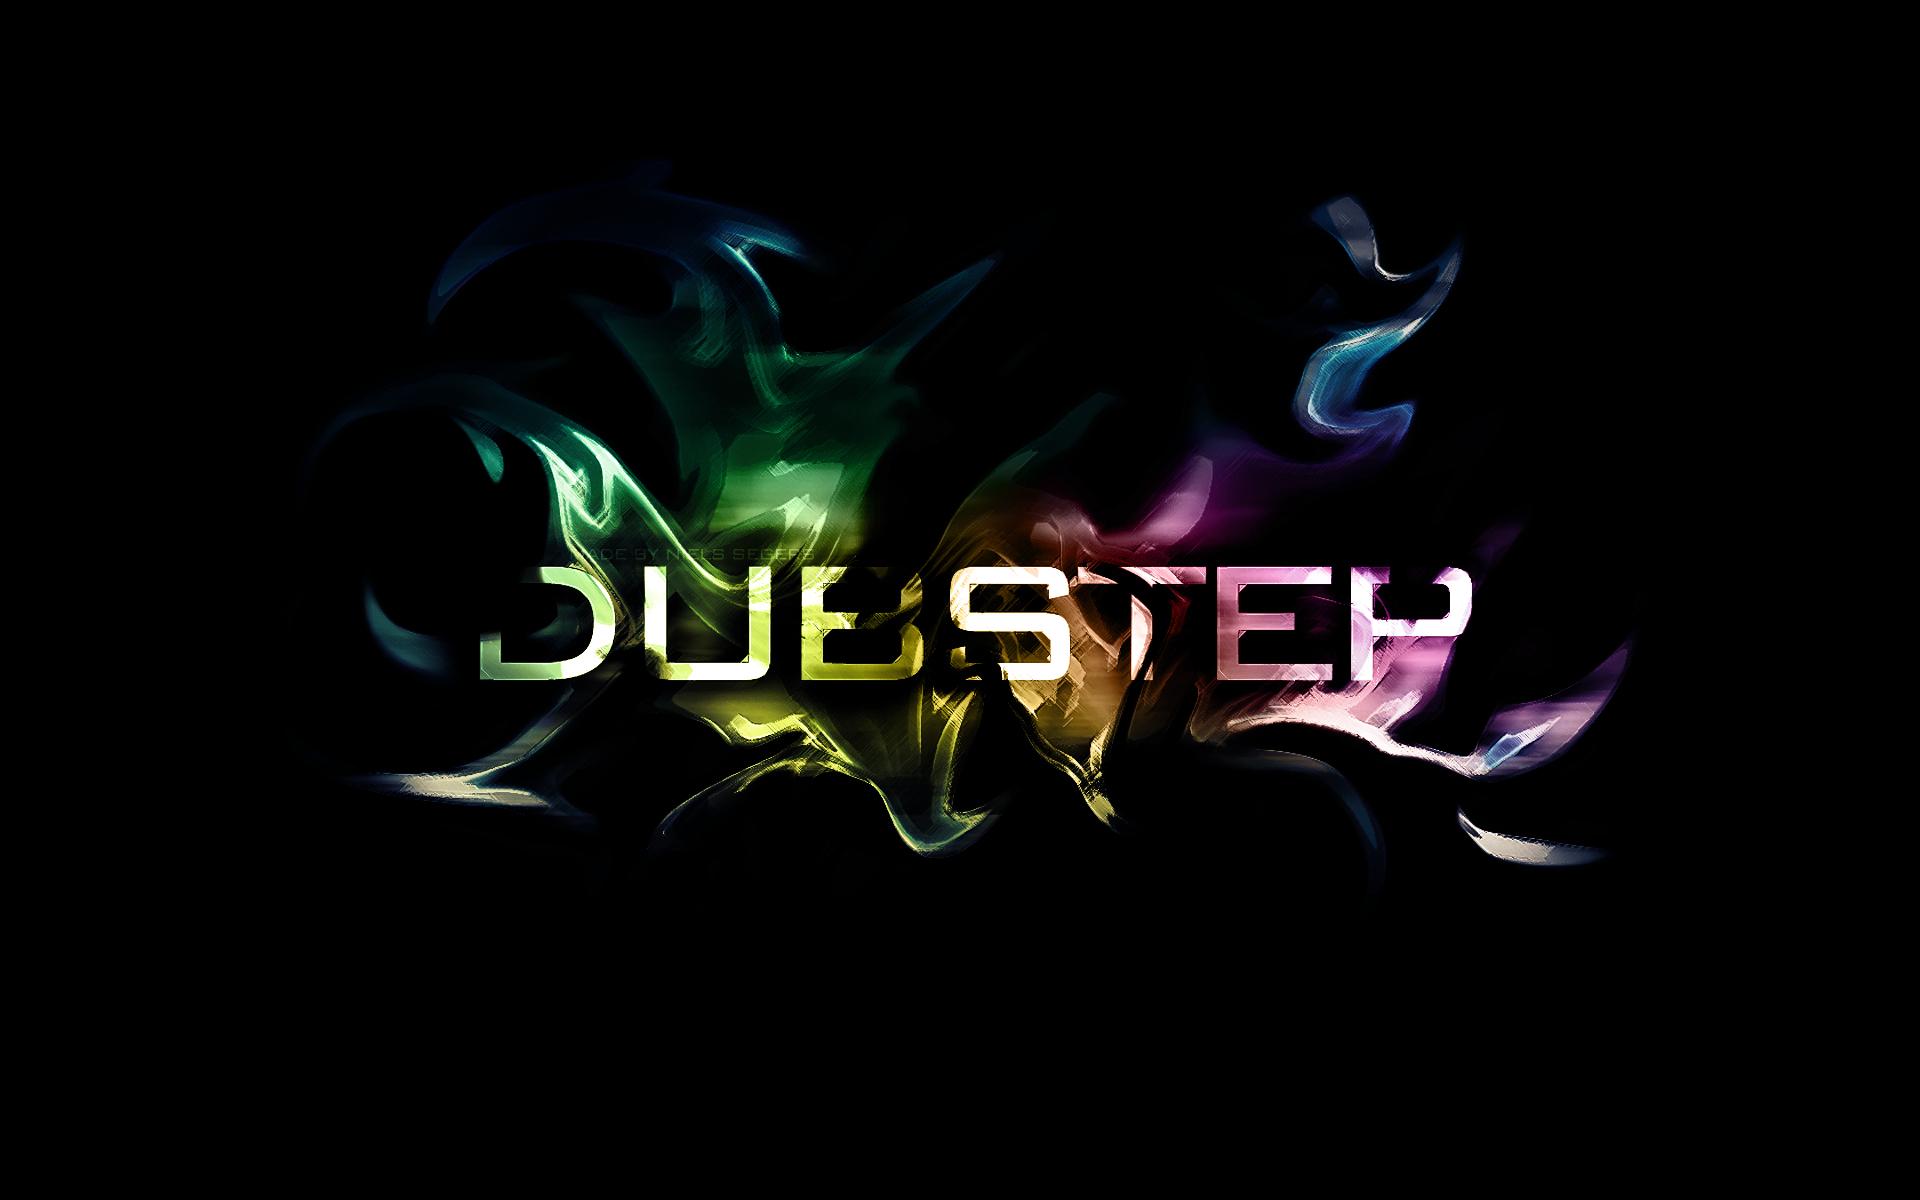 Dubstep Background Wallpaper #6935163